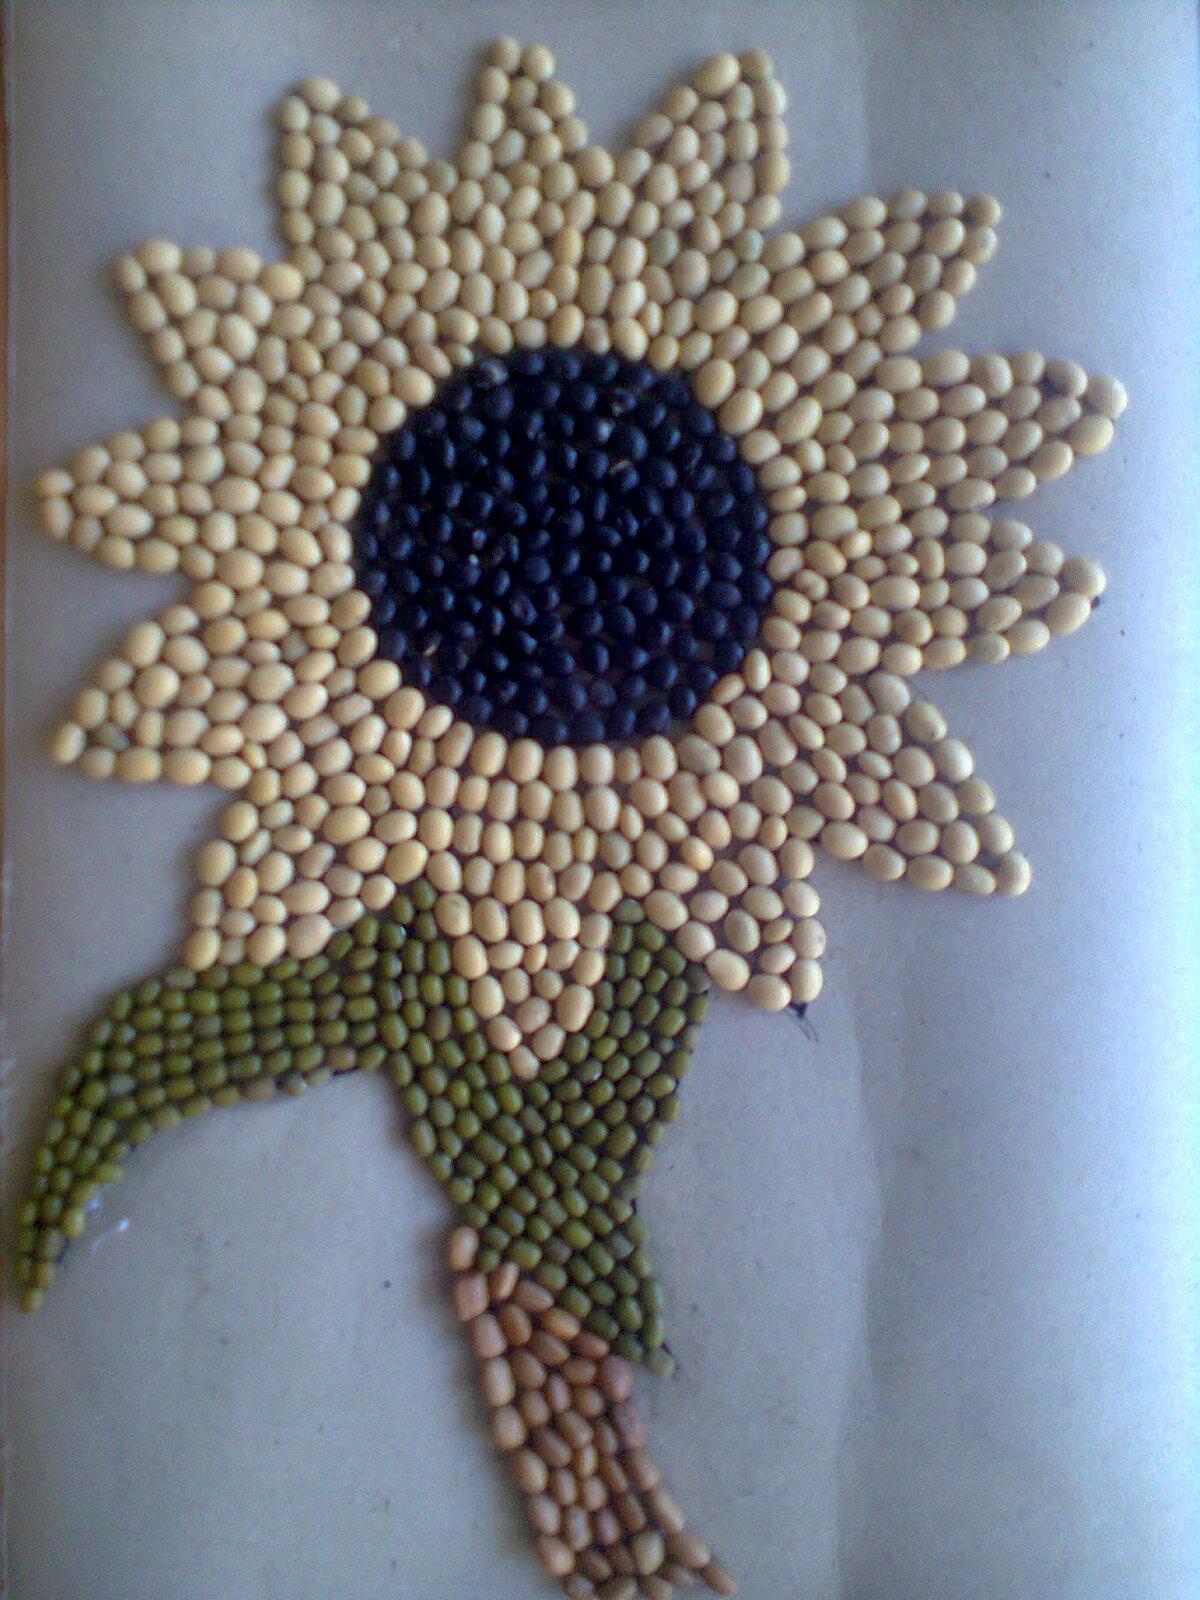 Gambar Kolase Bunga Dari Biji Bijian Kertasbulat